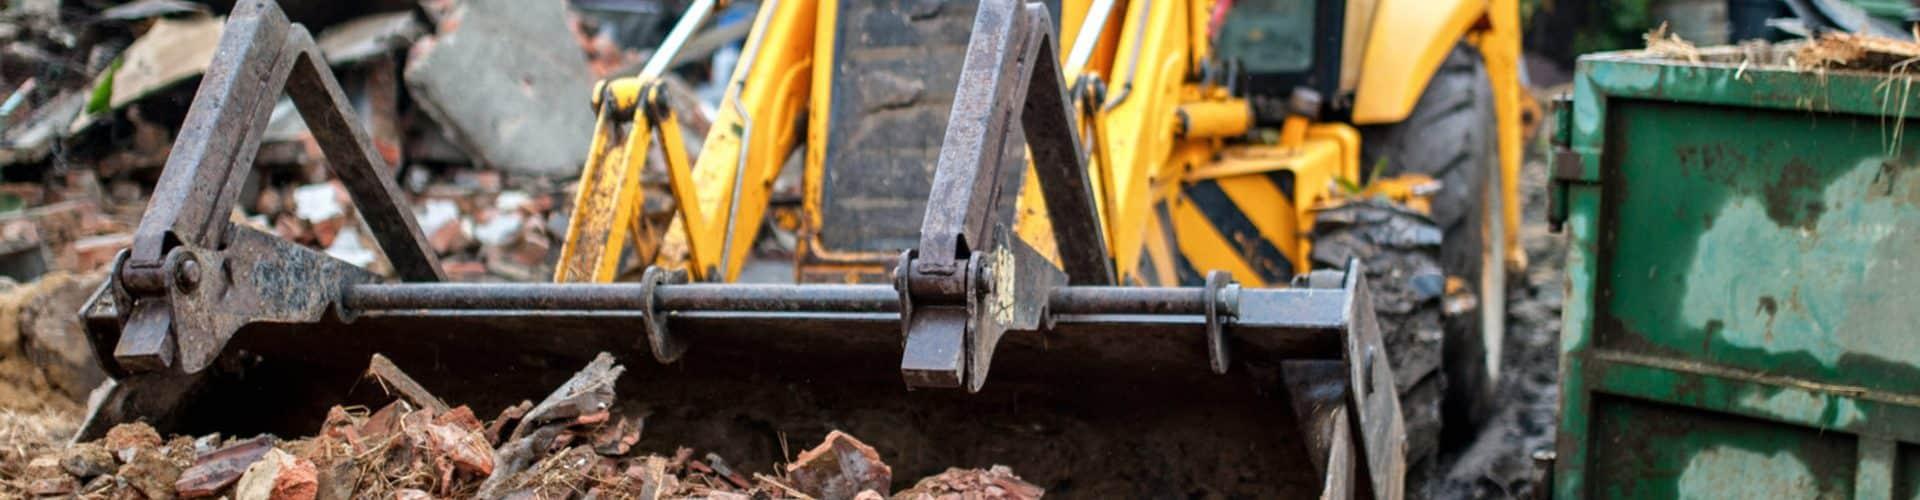 Bulldozer gathering debris from a house - Big Easy Demolition